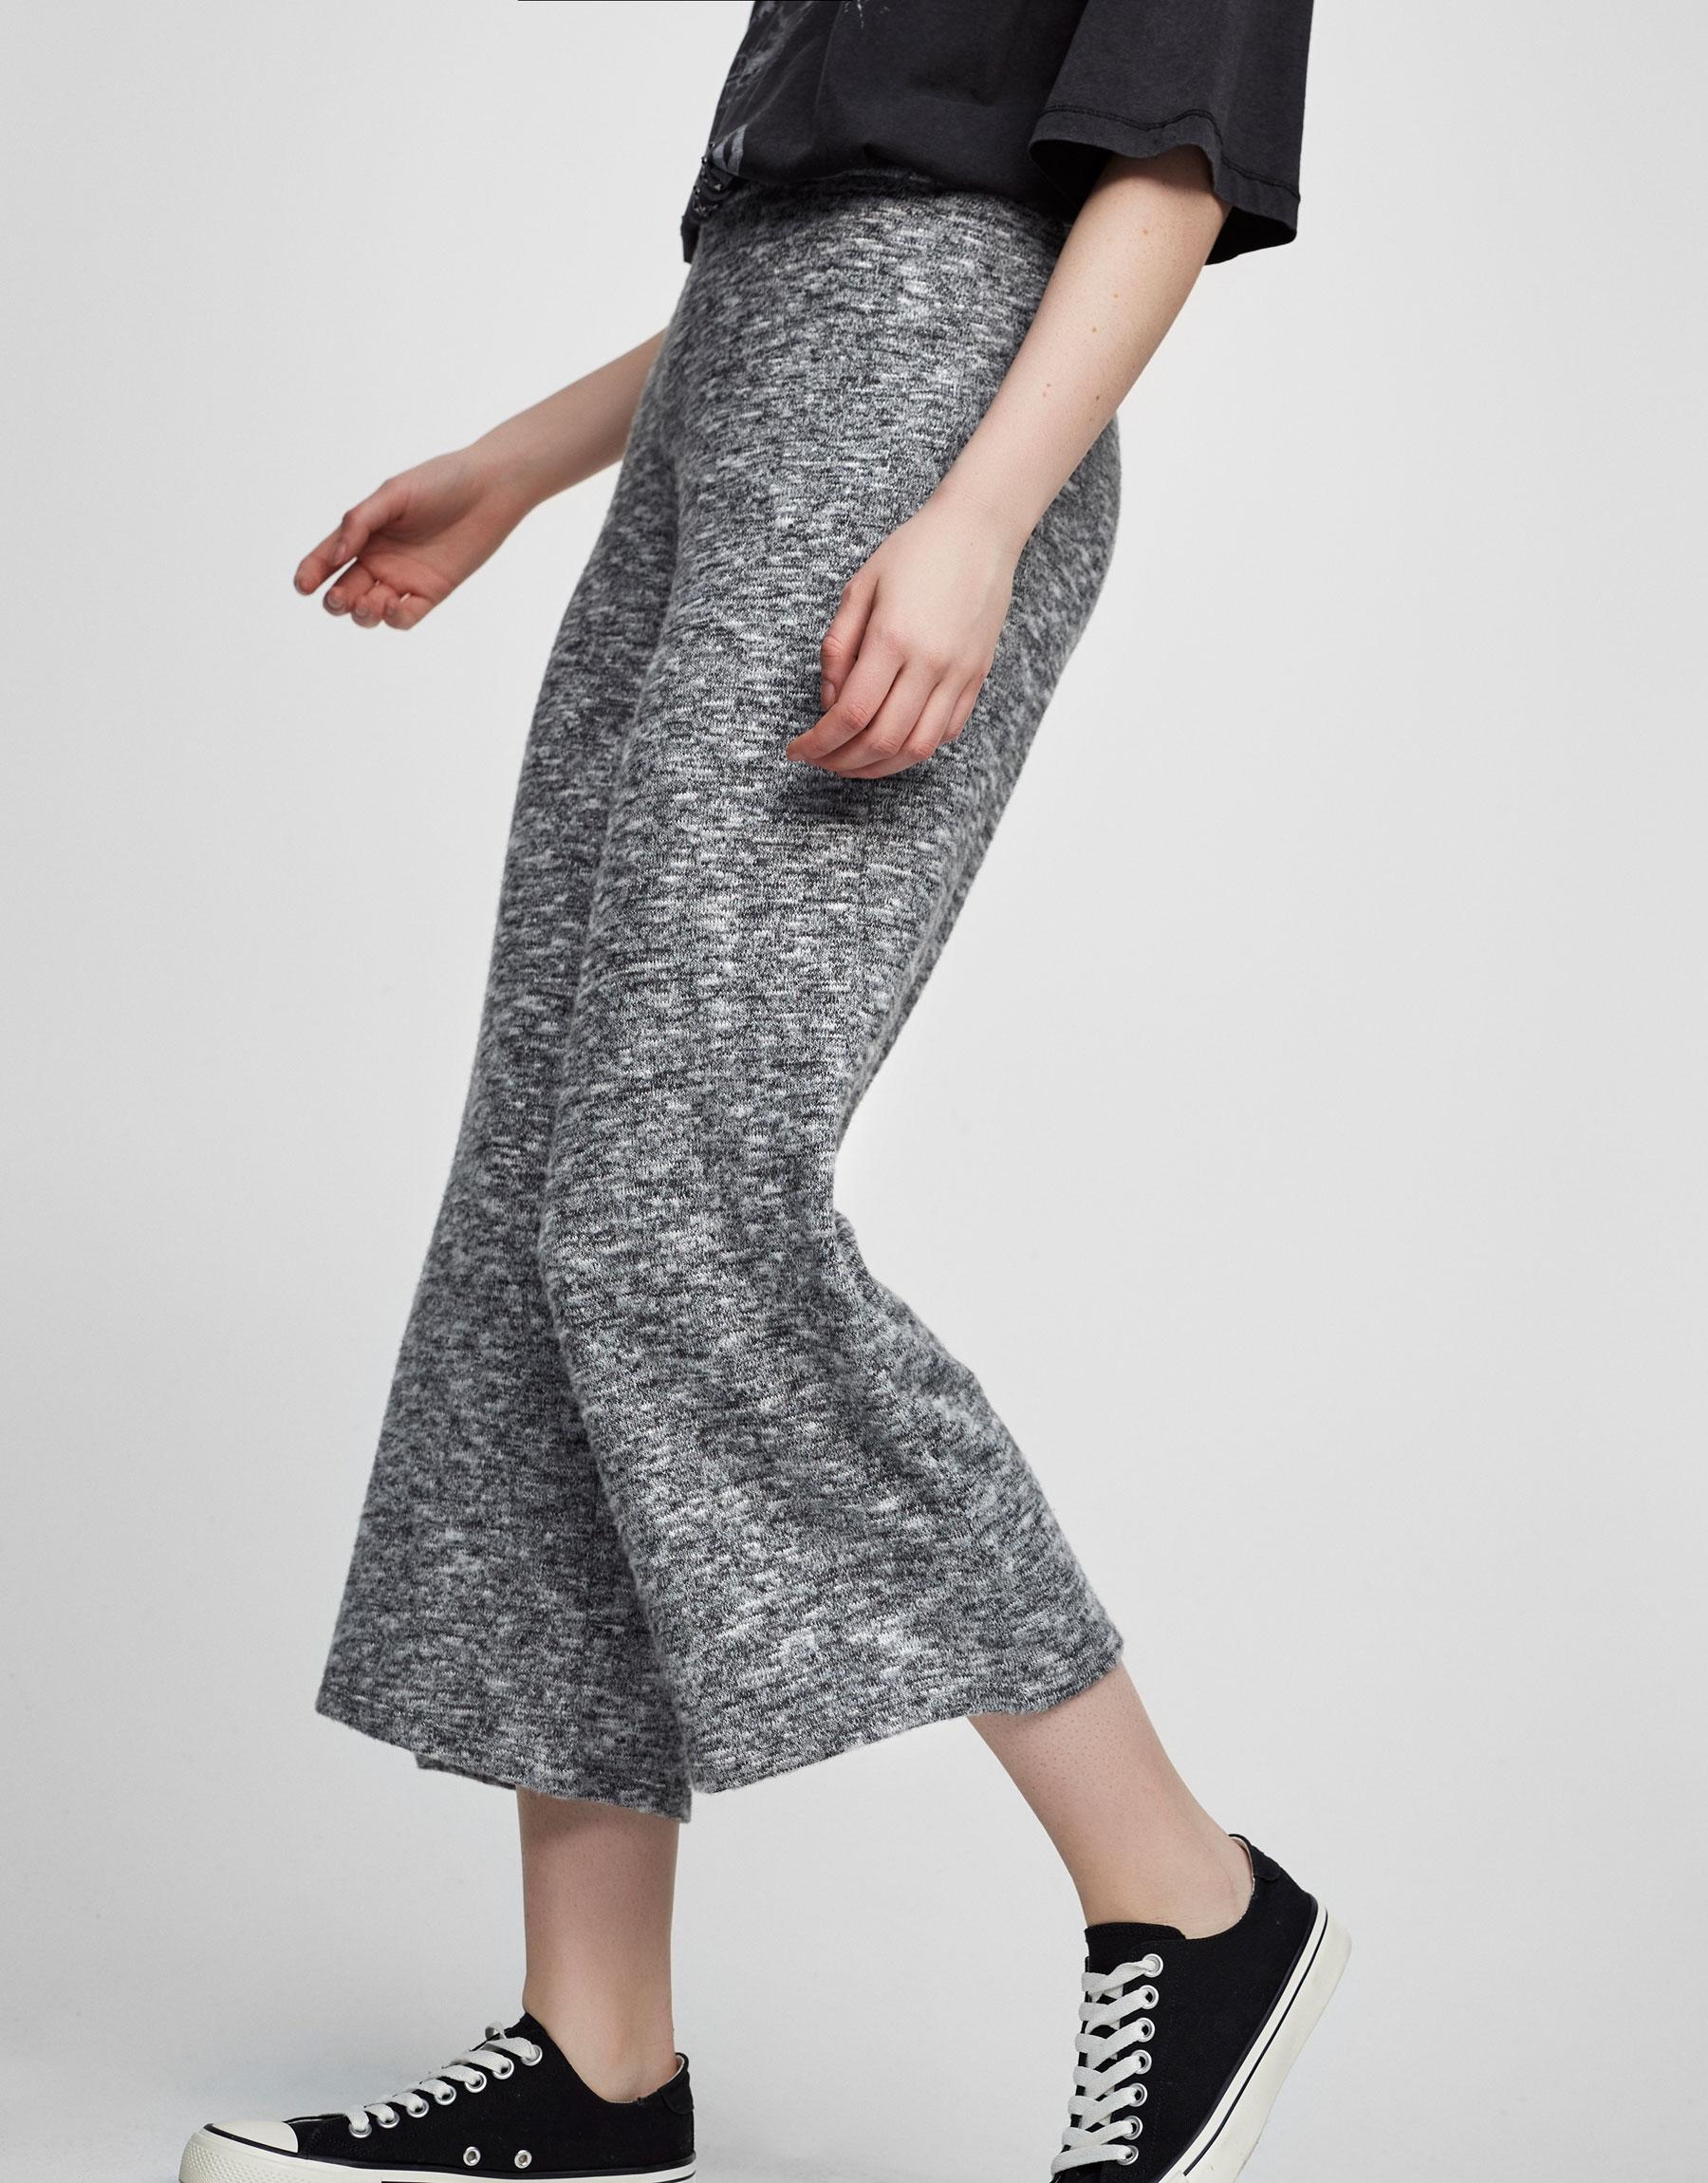 Knit culottes